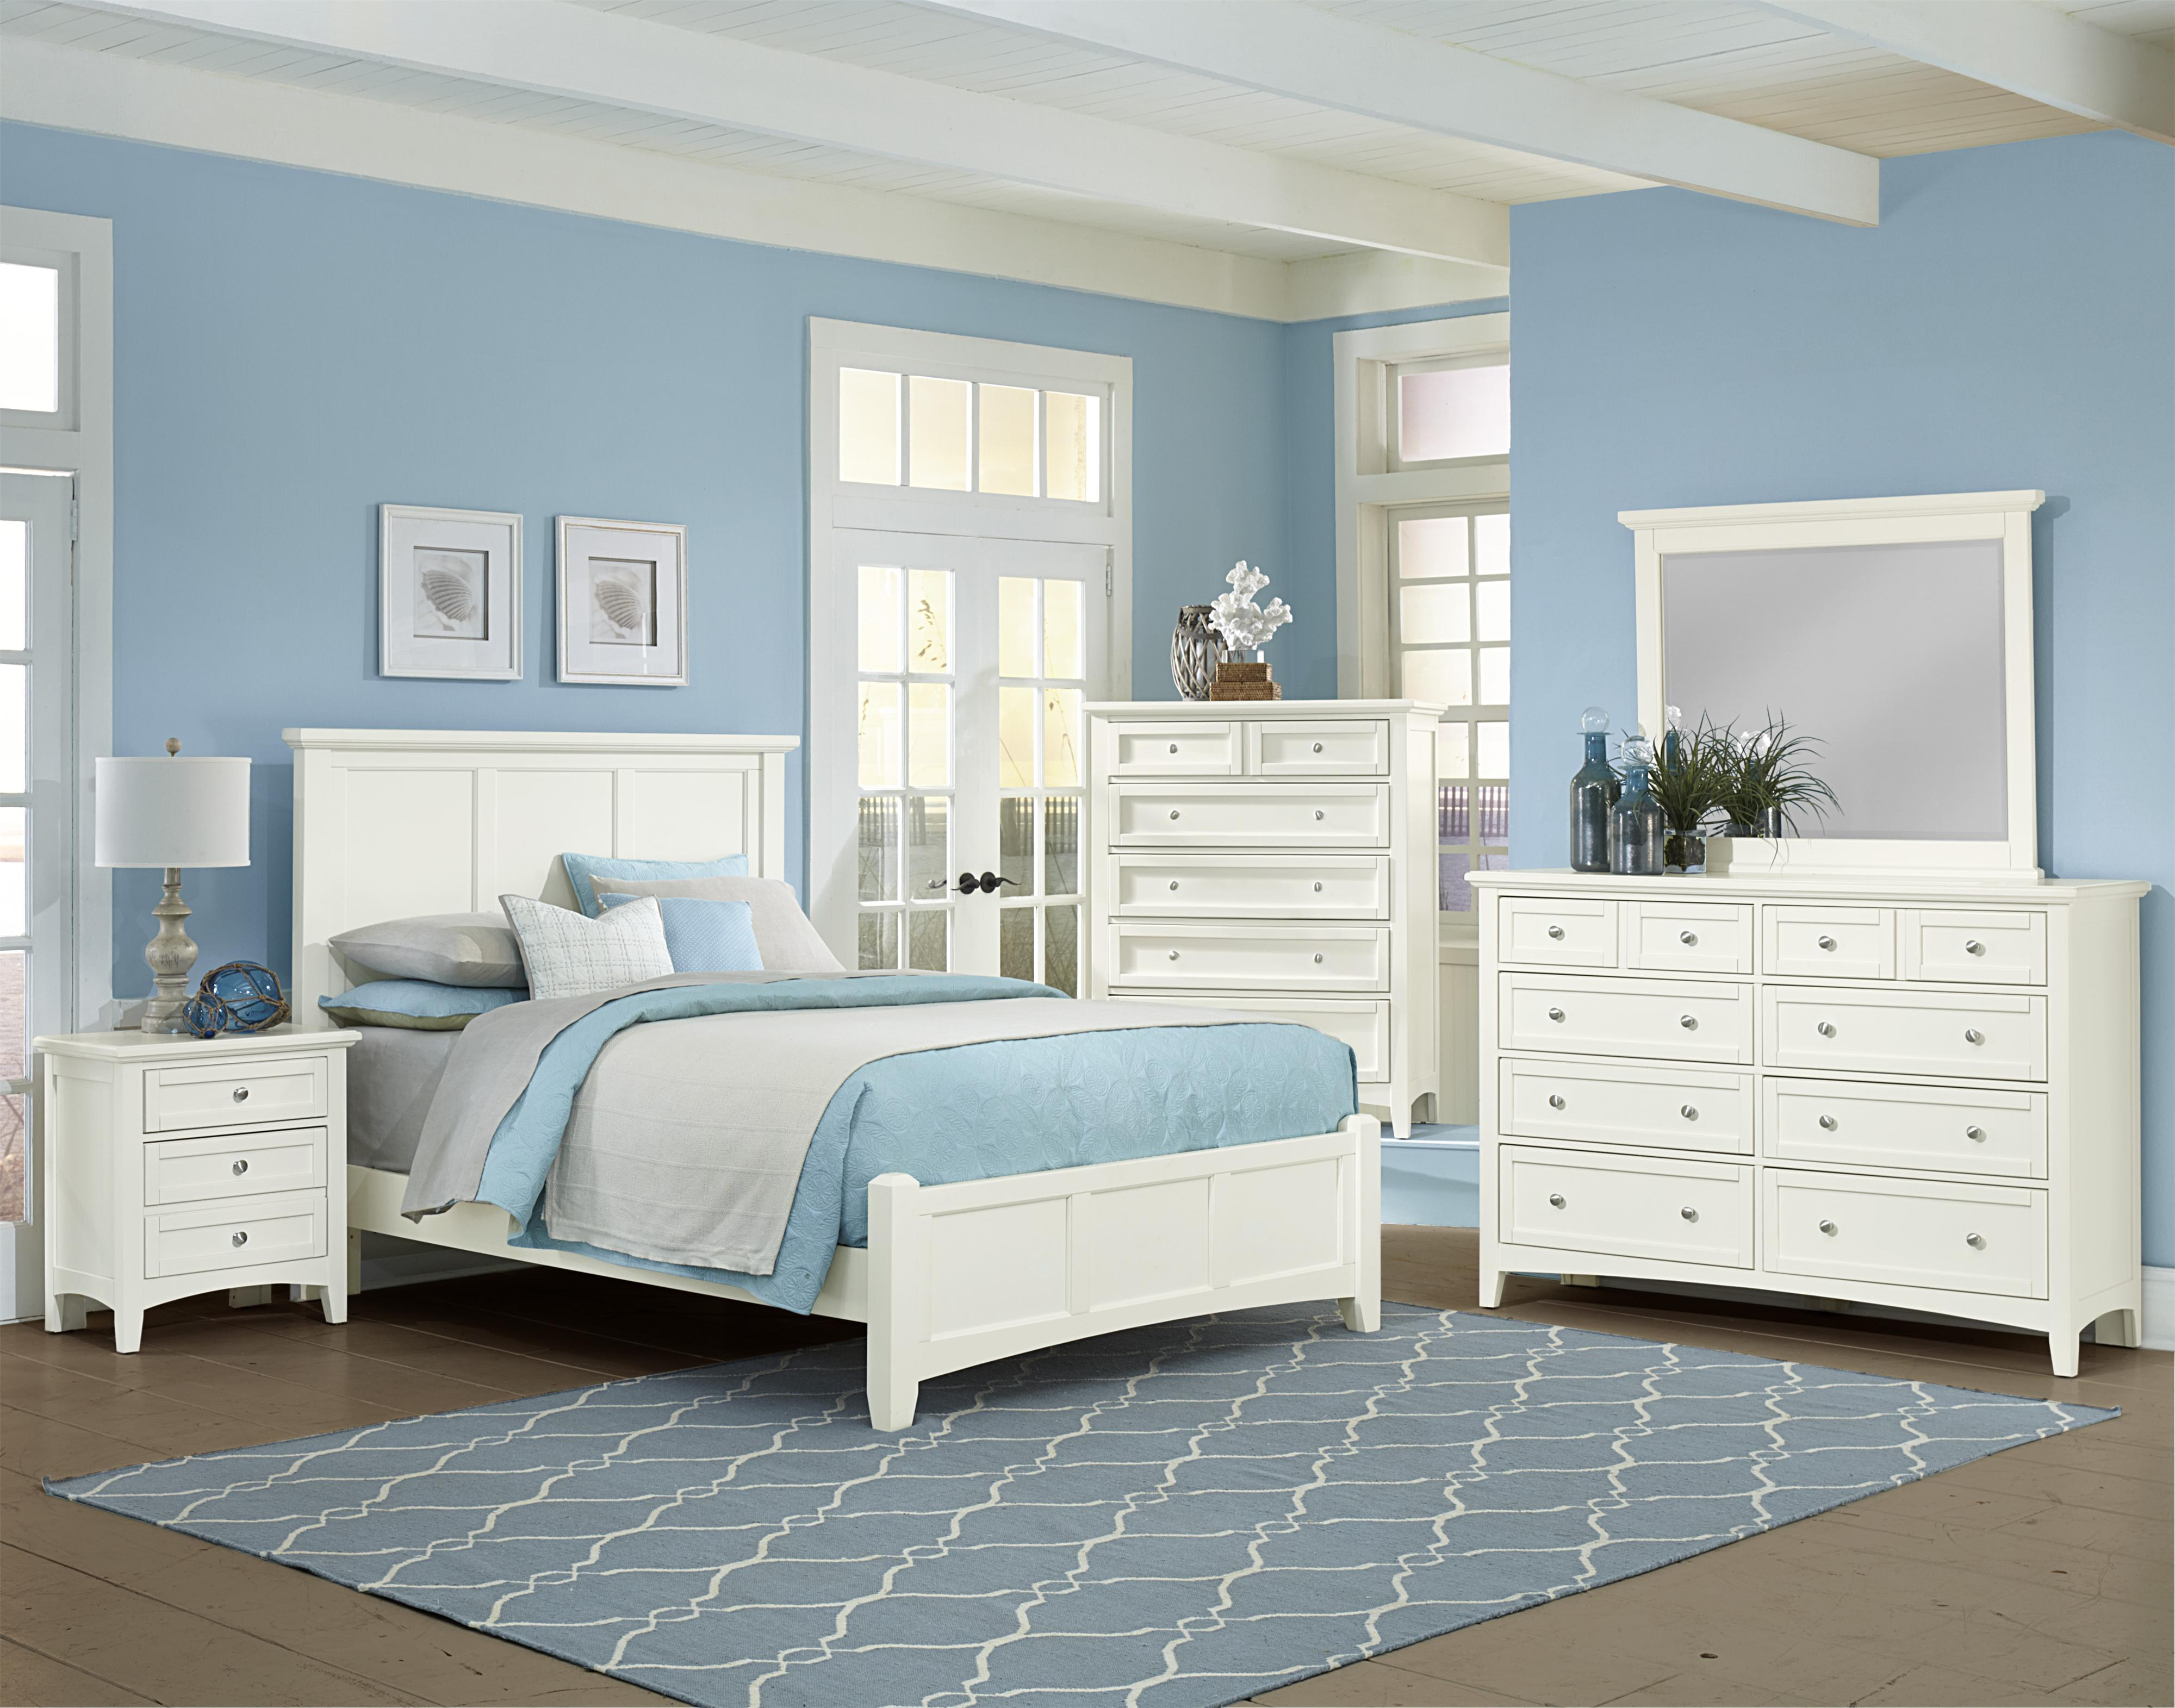 Bonanza Full Bedroom Group by Vaughan Bassett at Steger's Furniture